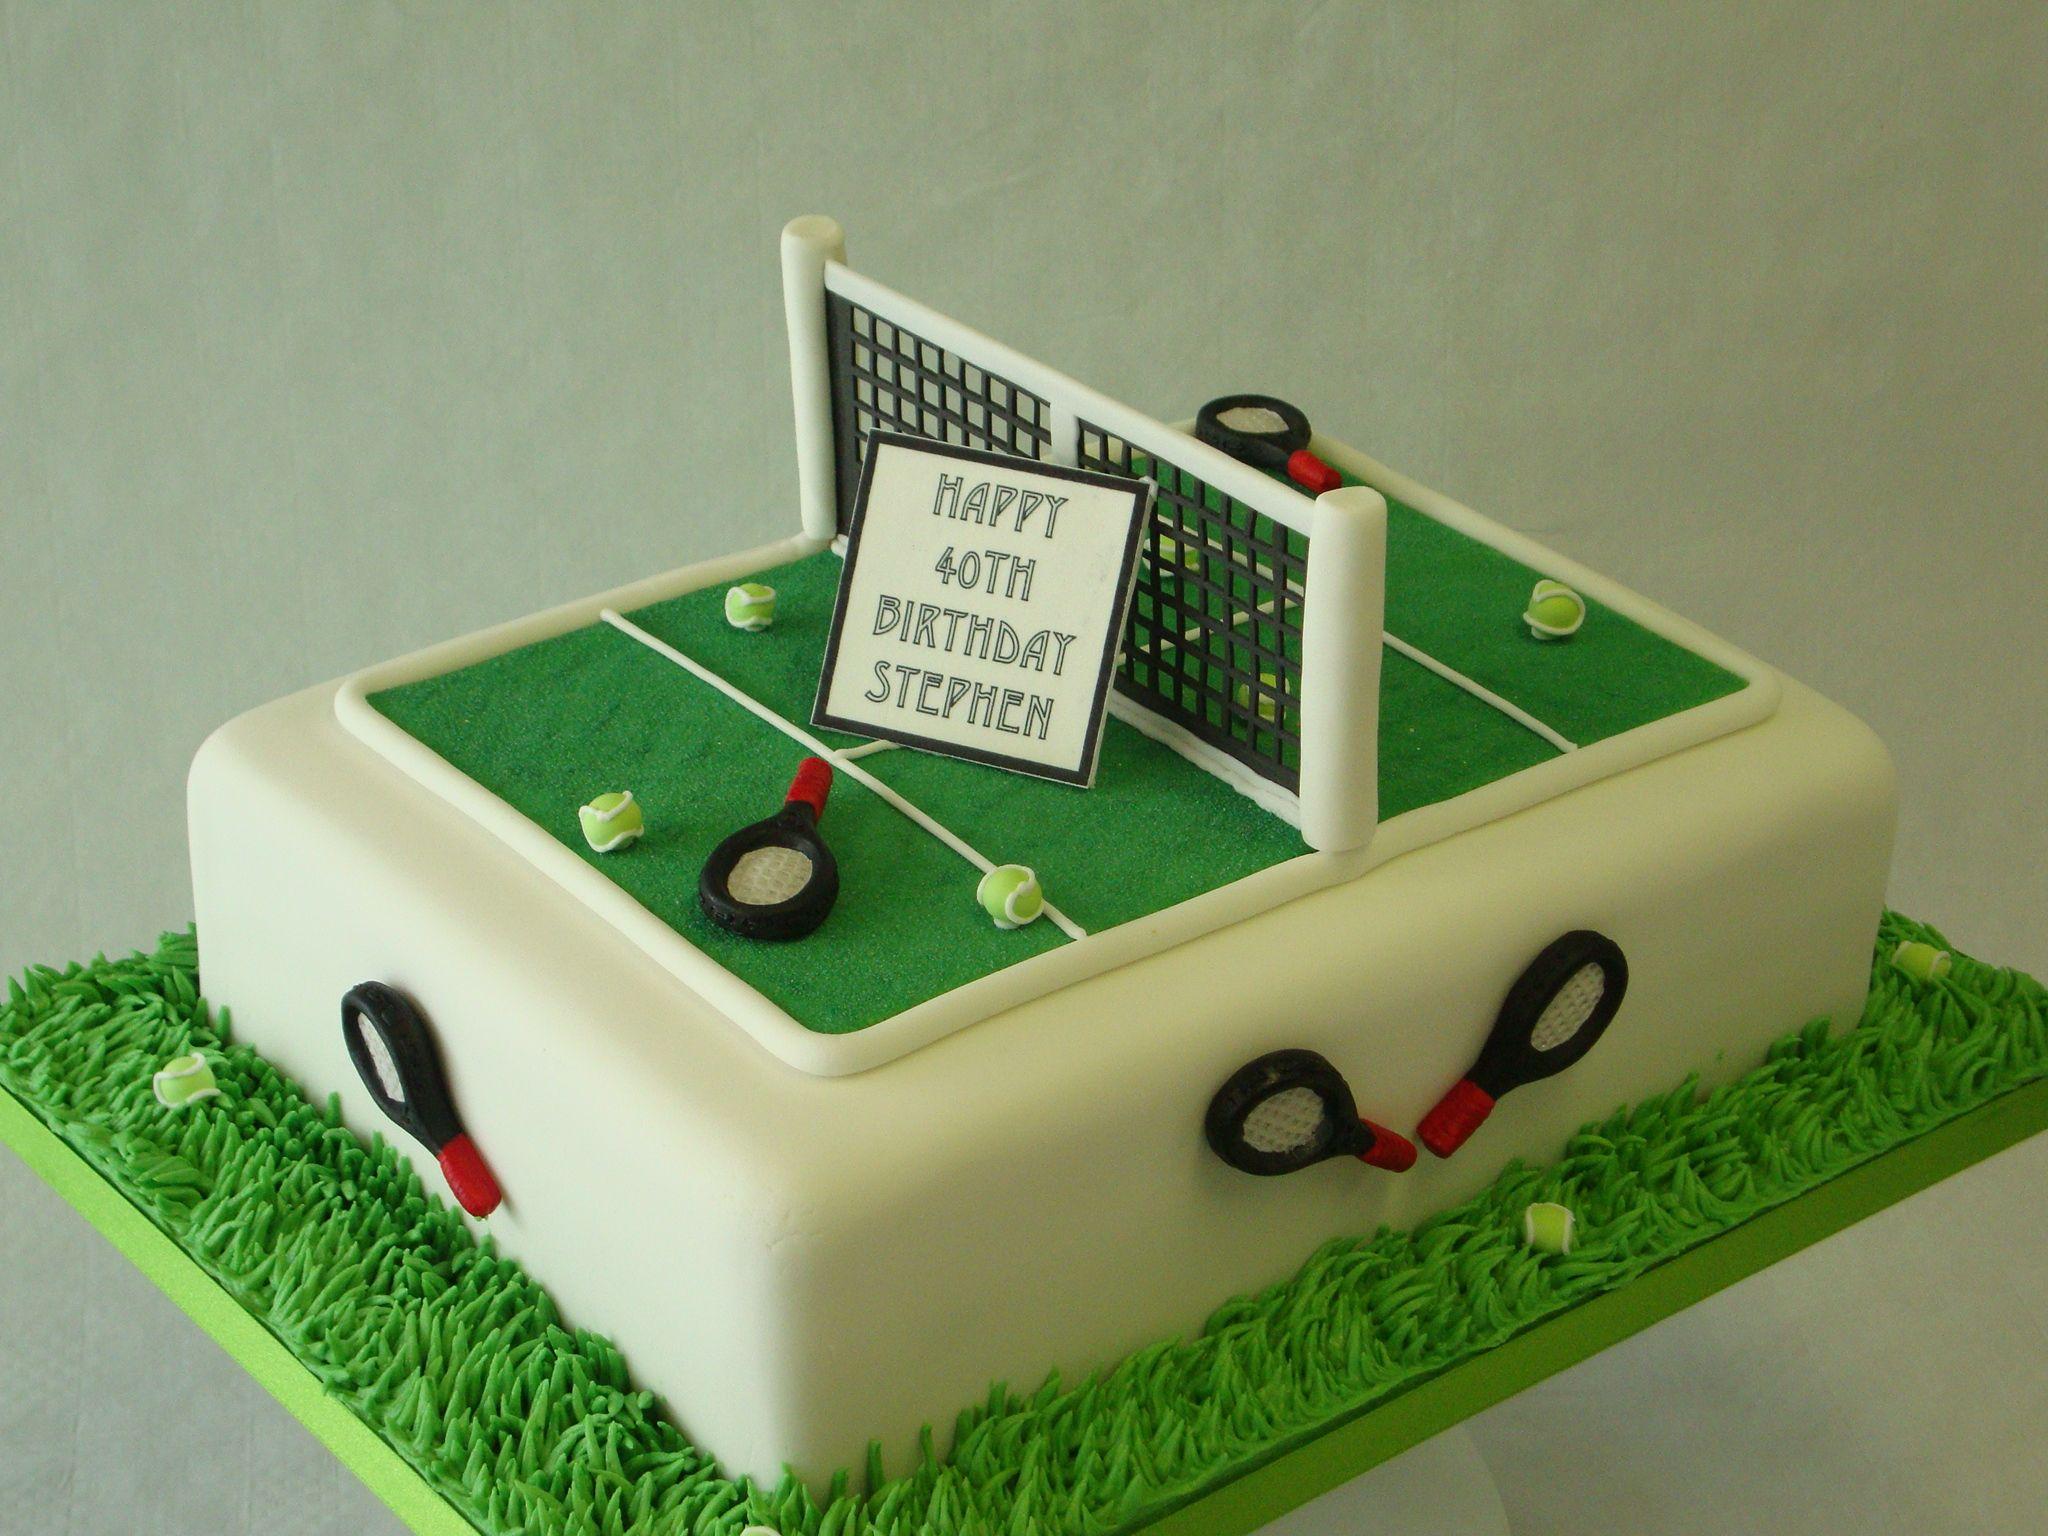 Tennis Court Cake Celebration Cakes Tennis Cake Tennis Cupcakes Cake